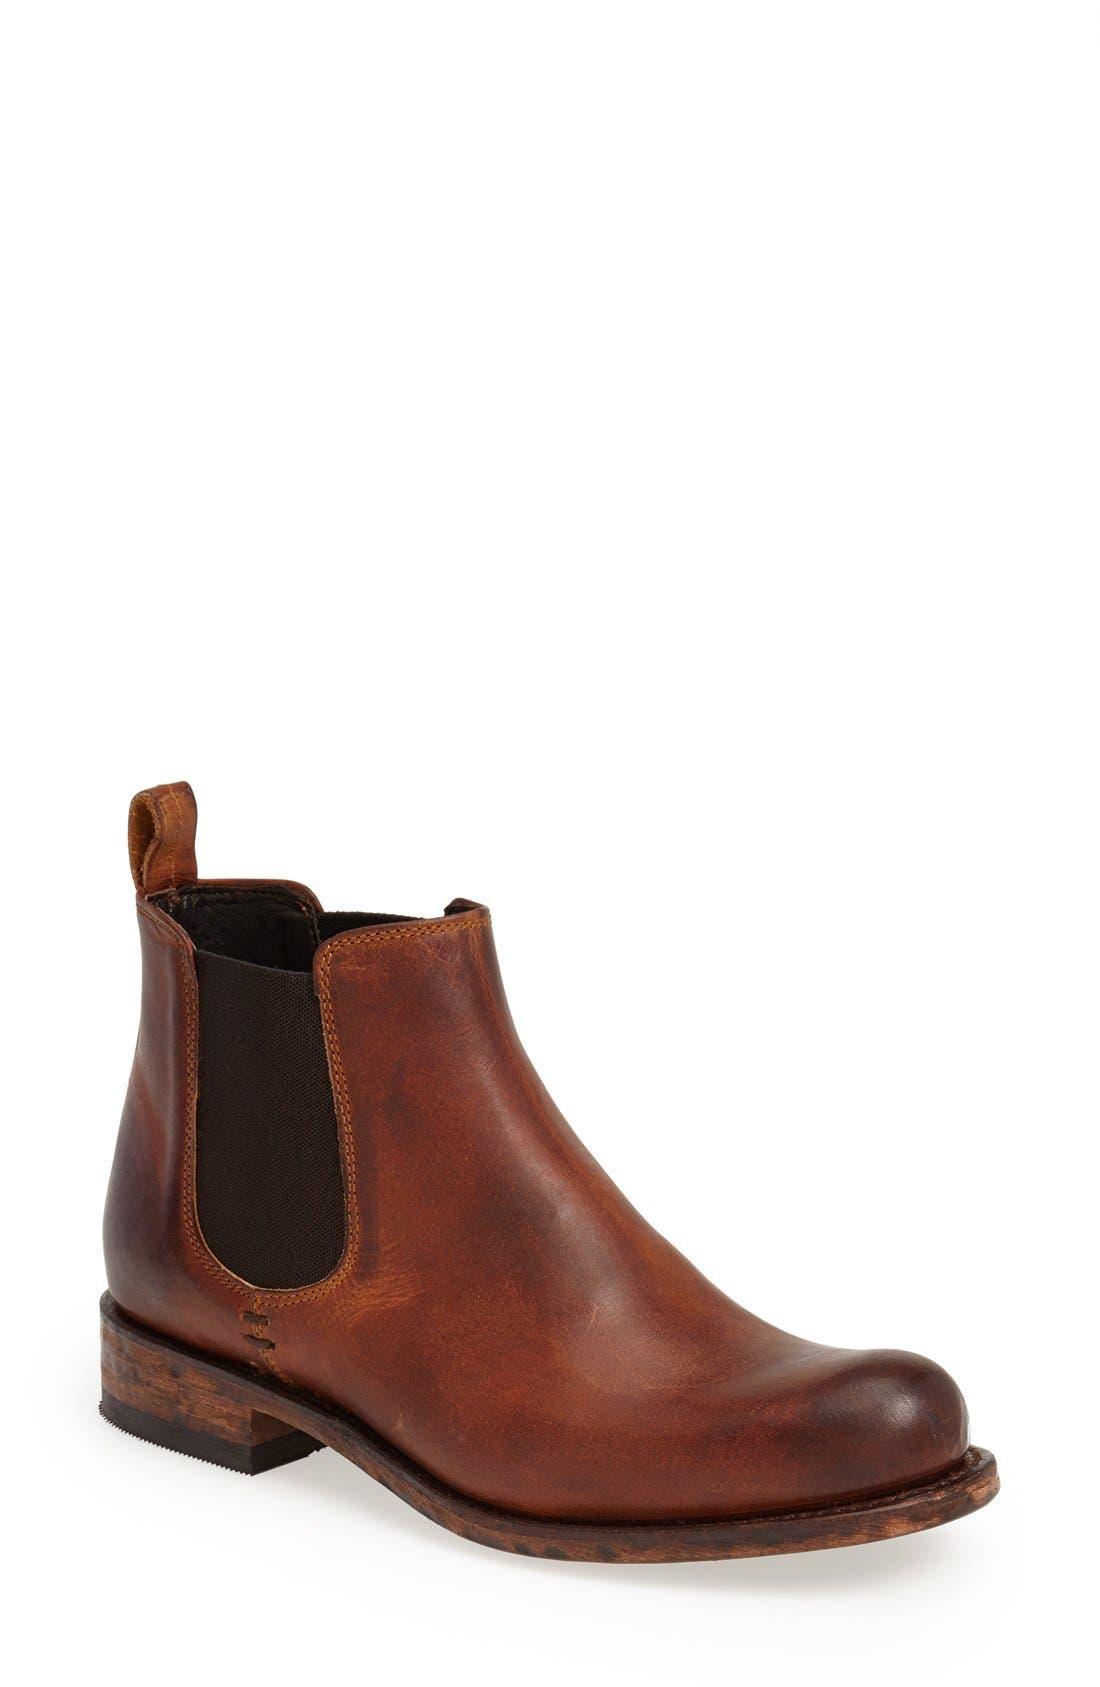 Alternate Image 1 Selected - Sendra 'Barret' Chelsea Boot (Women)